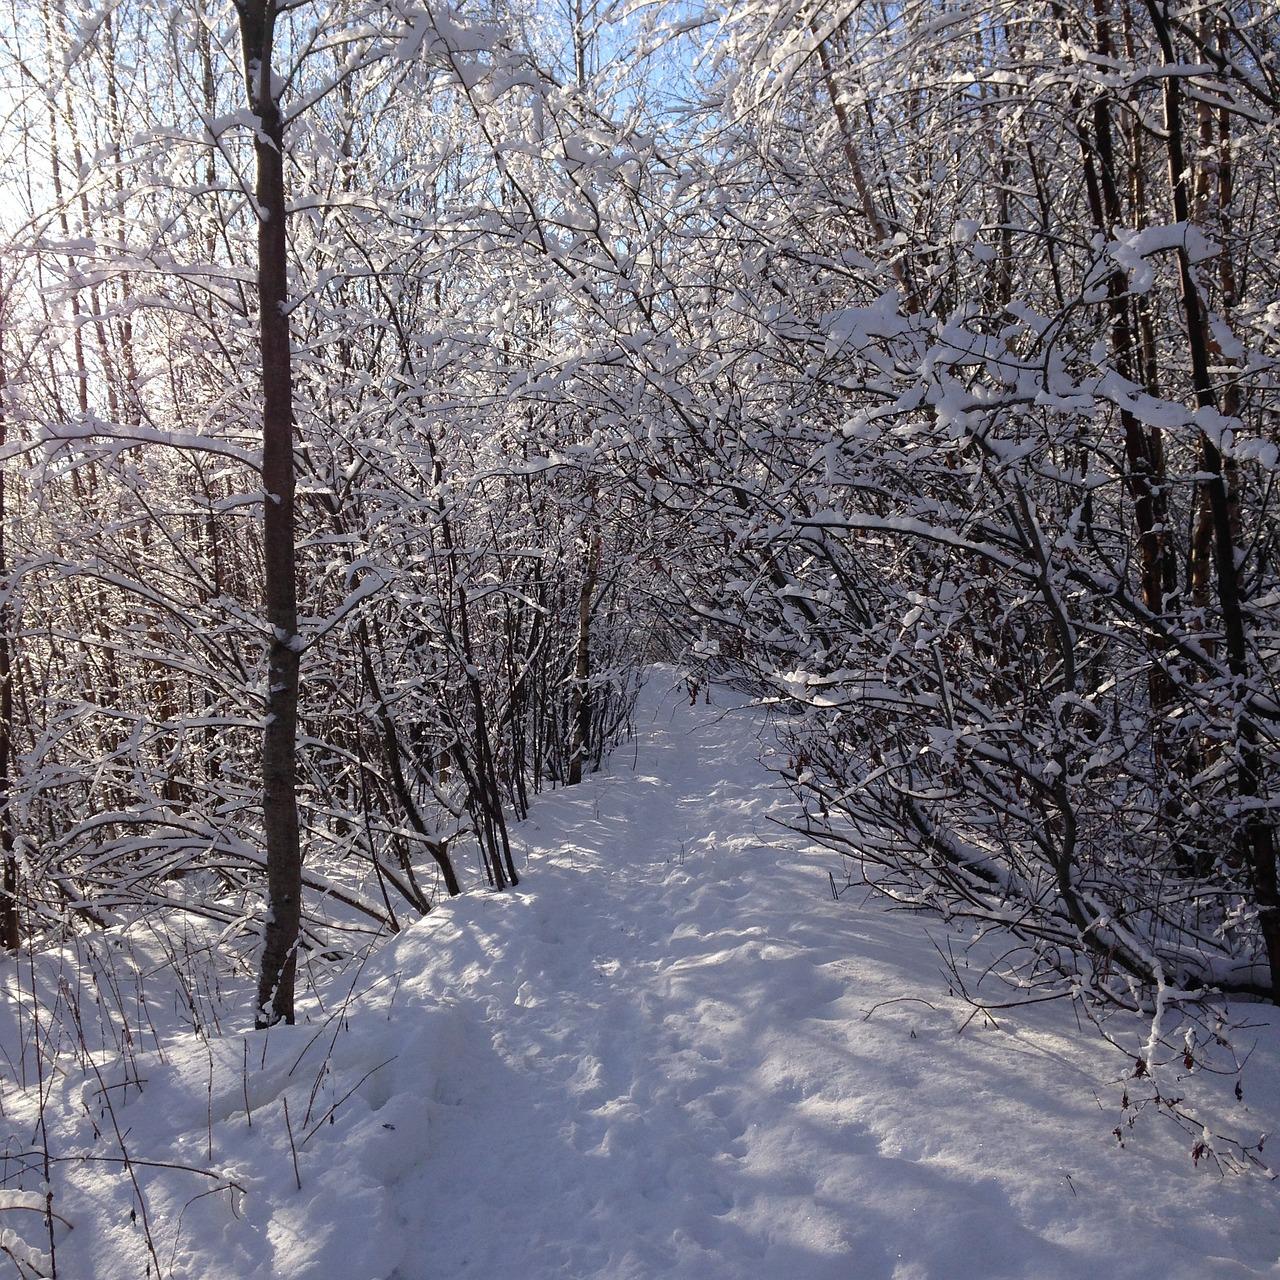 изготовить блокнот зимний лес луза фото все шутку вспоминают